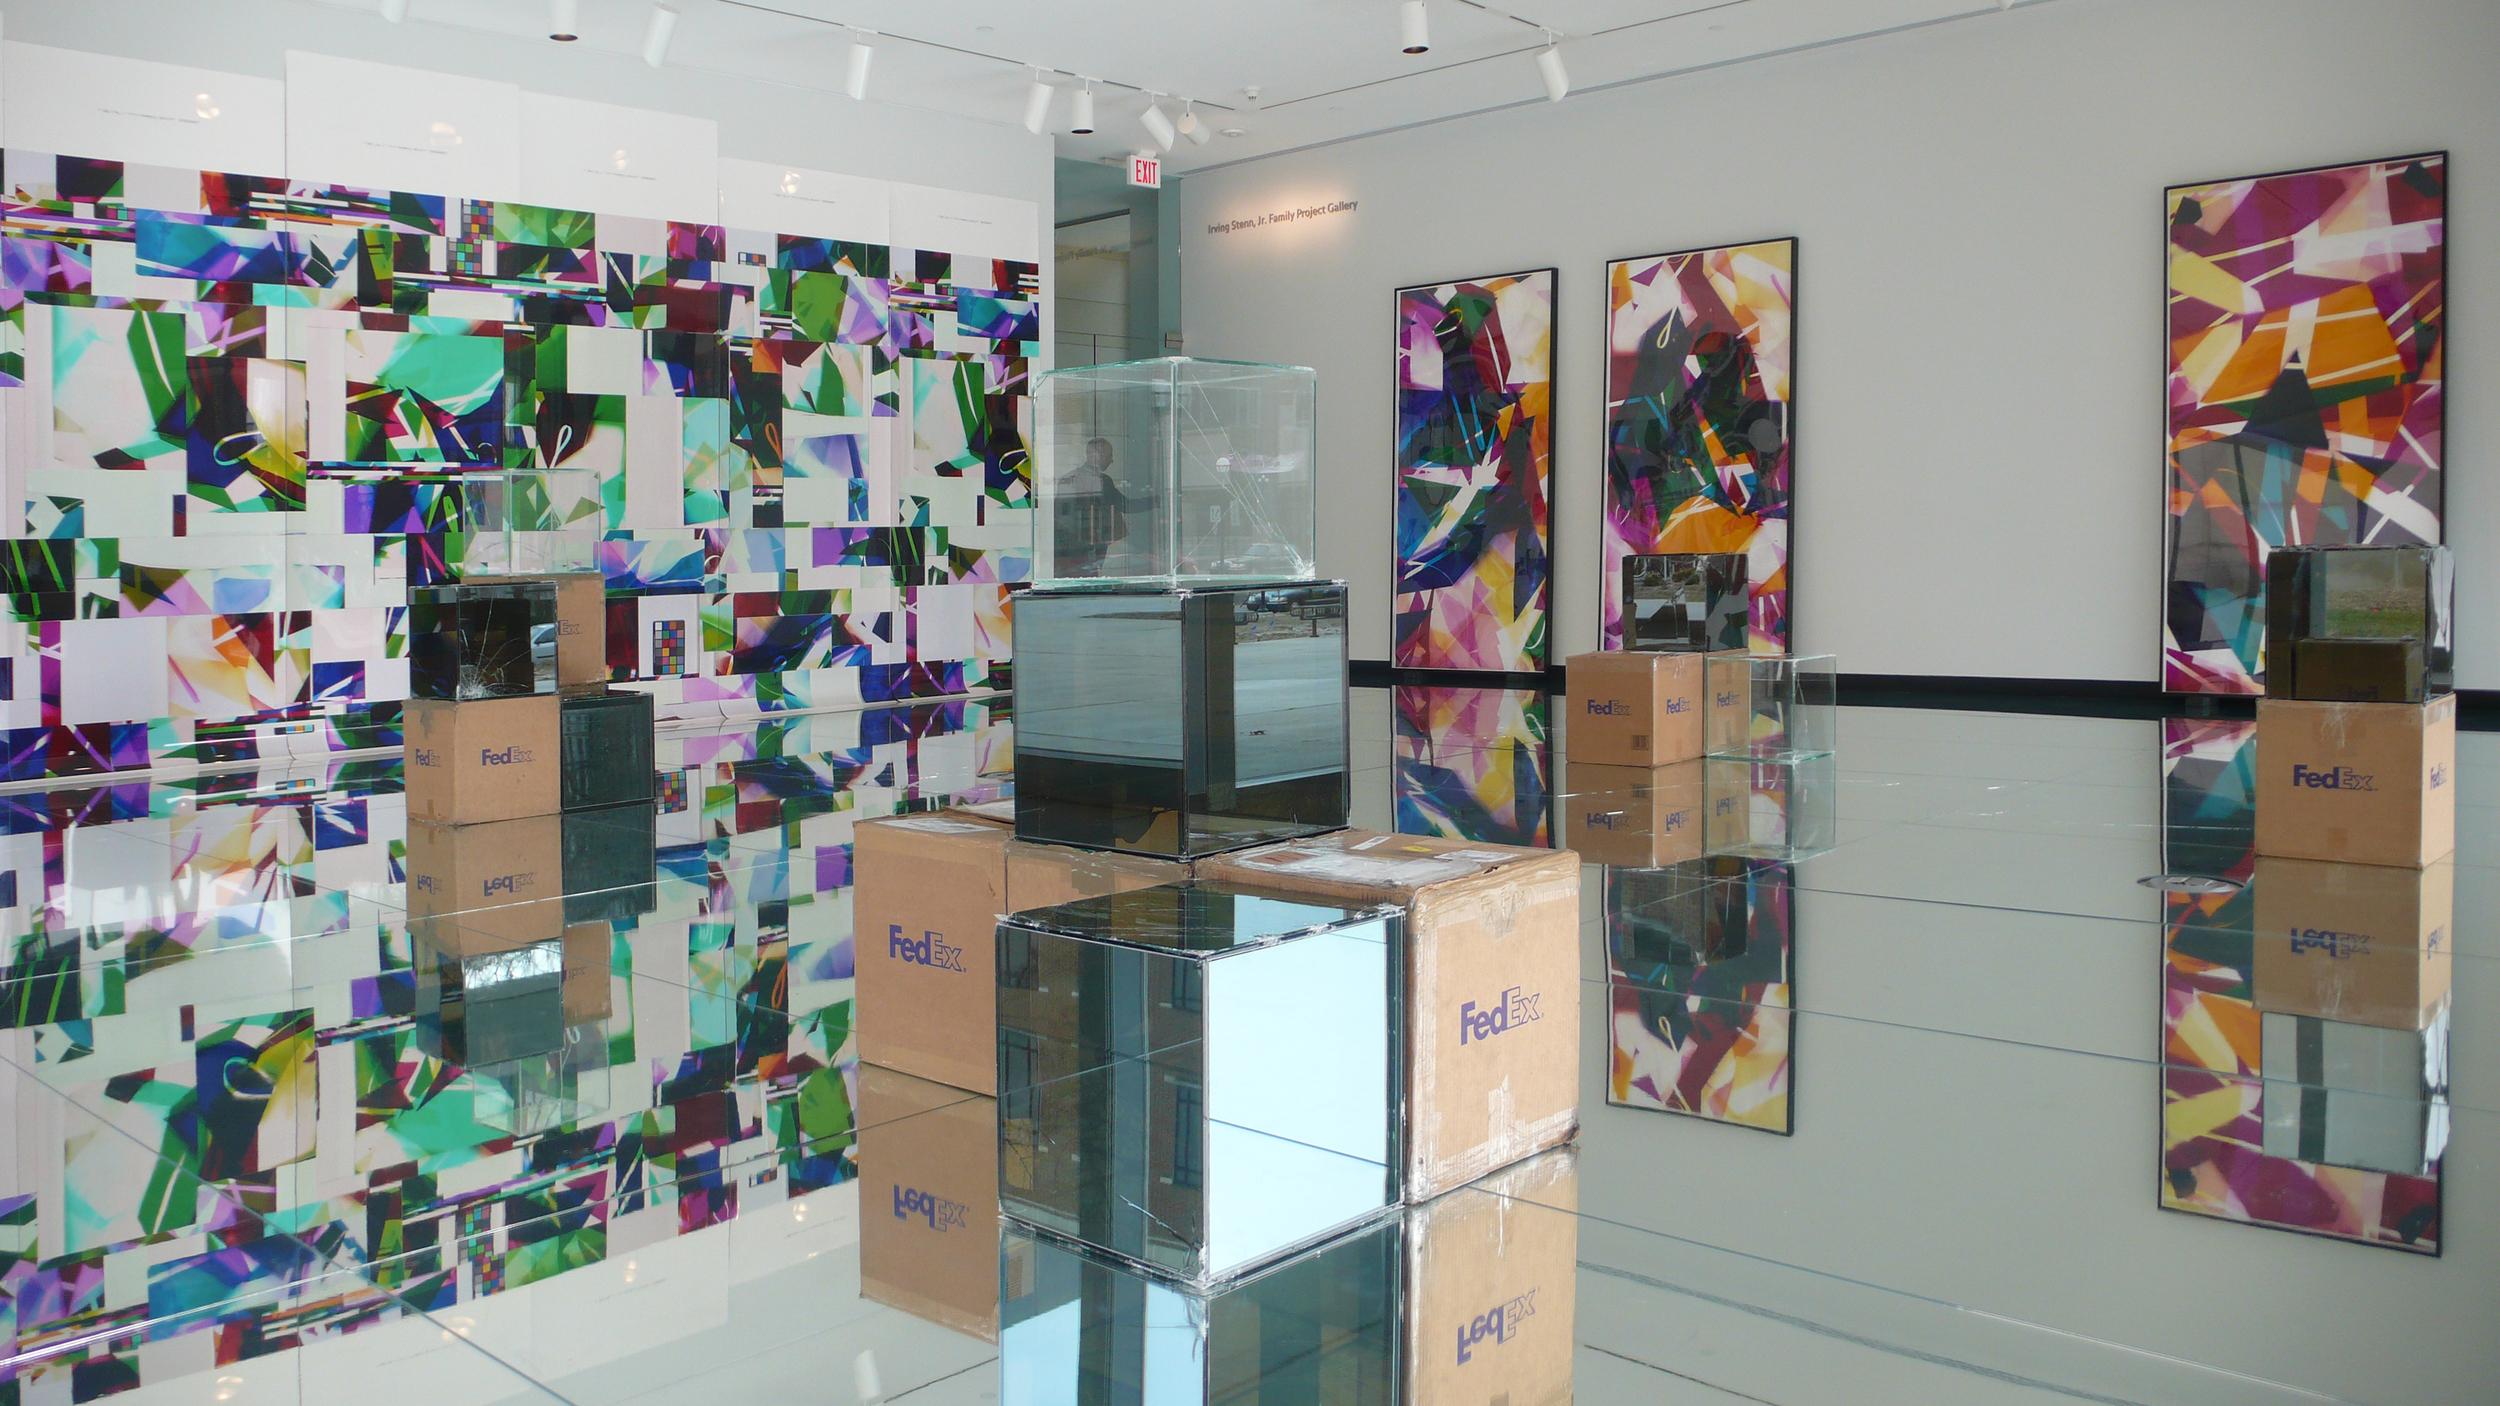 Pulleys, Cogwheels, Mirrors, and Windows   University of Michigan Museum of Art  Ann Arbor  Michigan  2009